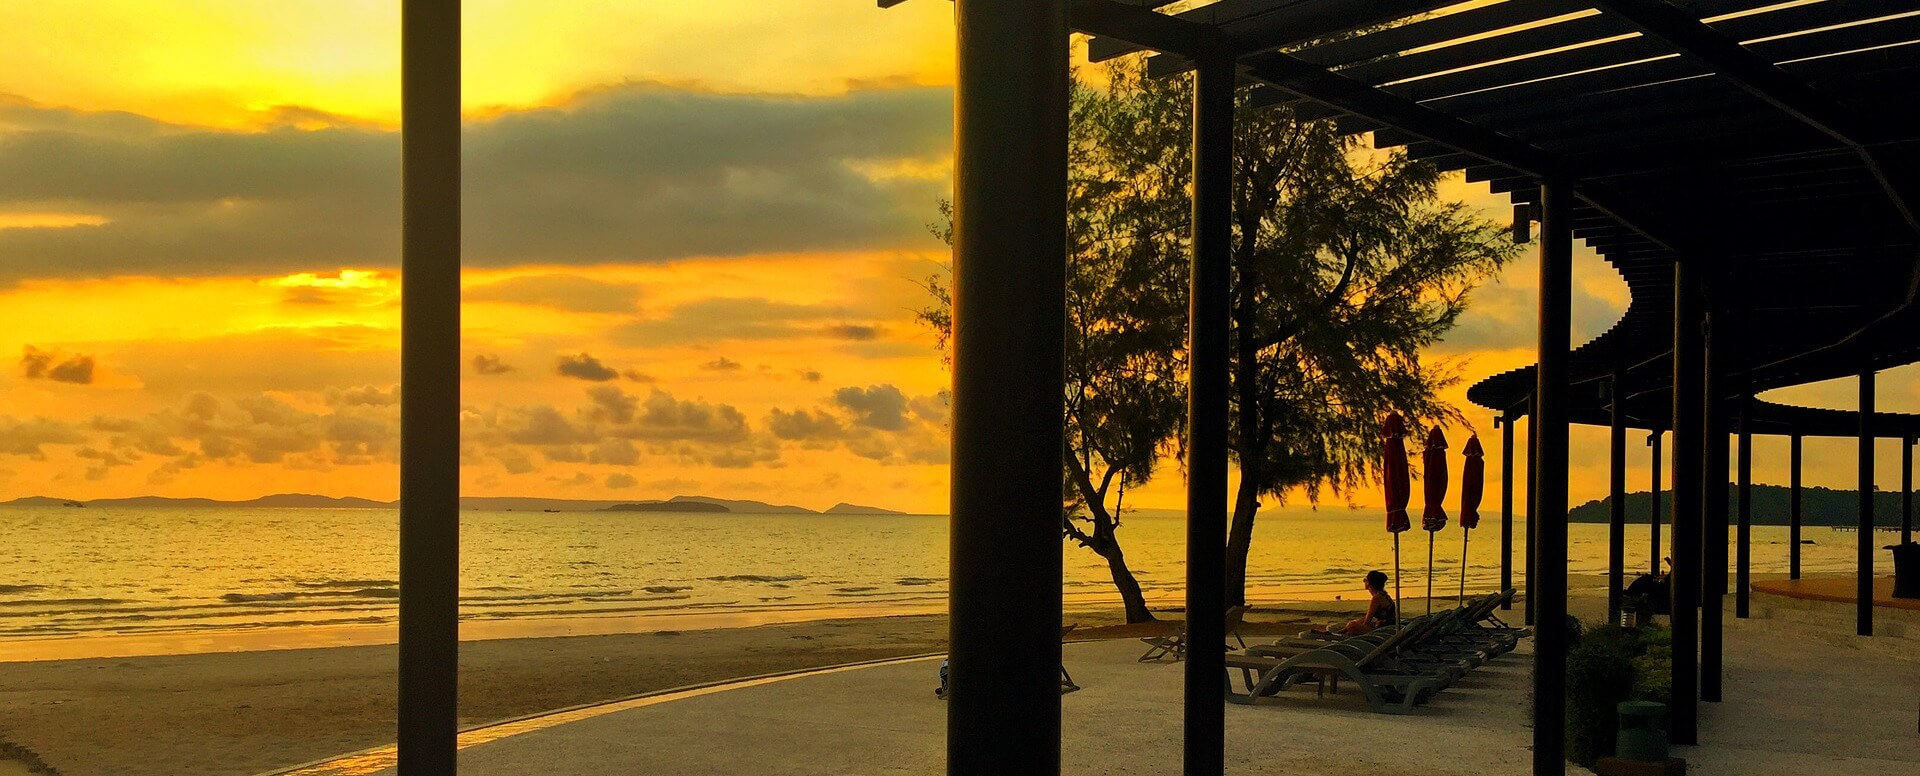 Relaxation in Sihanoukville - Cambodia